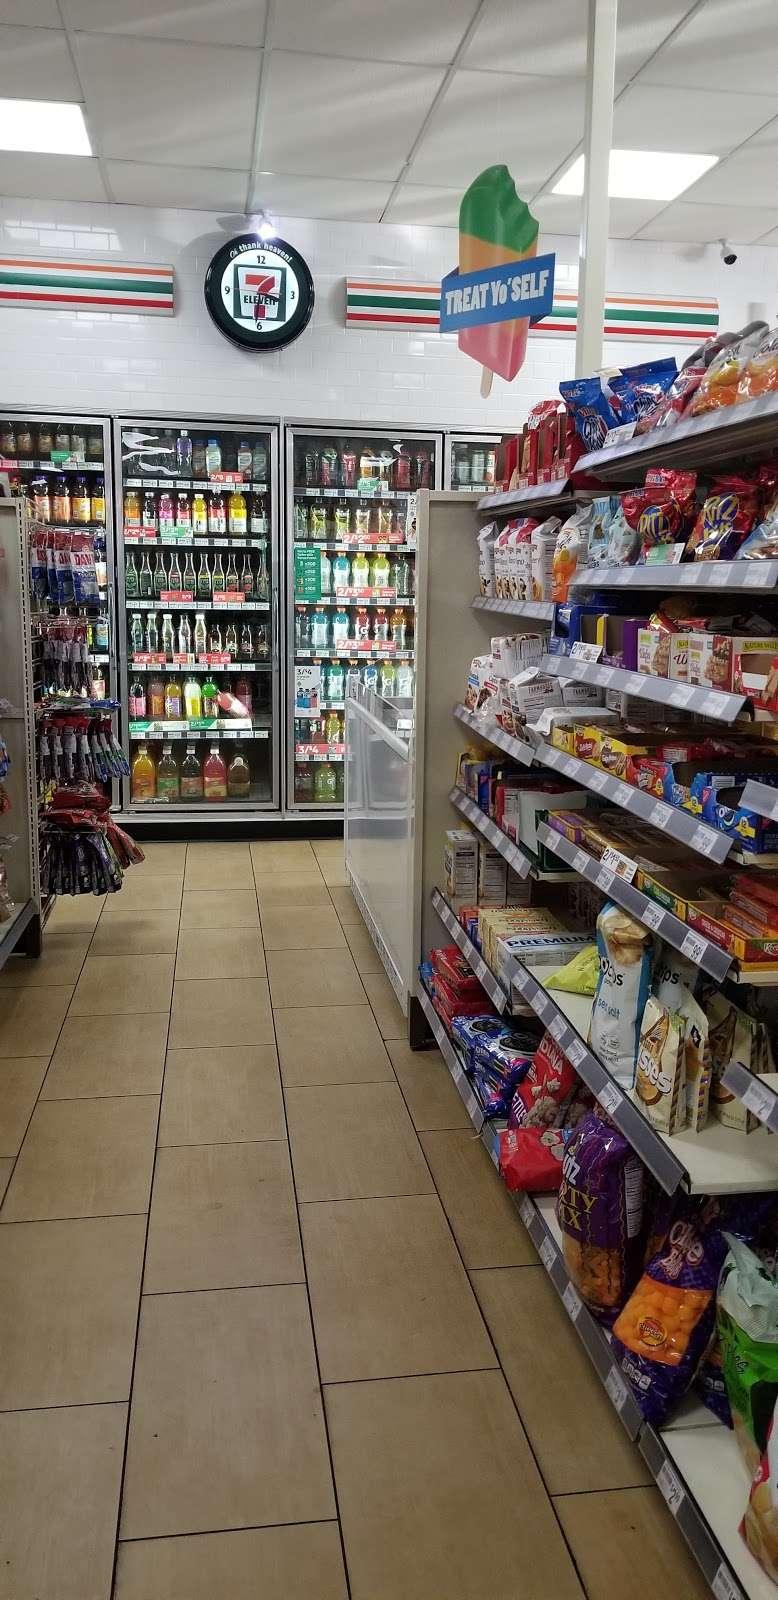 7-Eleven - convenience store  | Photo 8 of 10 | Address: 1189 Route 9 North, Old Bridge Township, NJ 08857, USA | Phone: (732) 727-0407